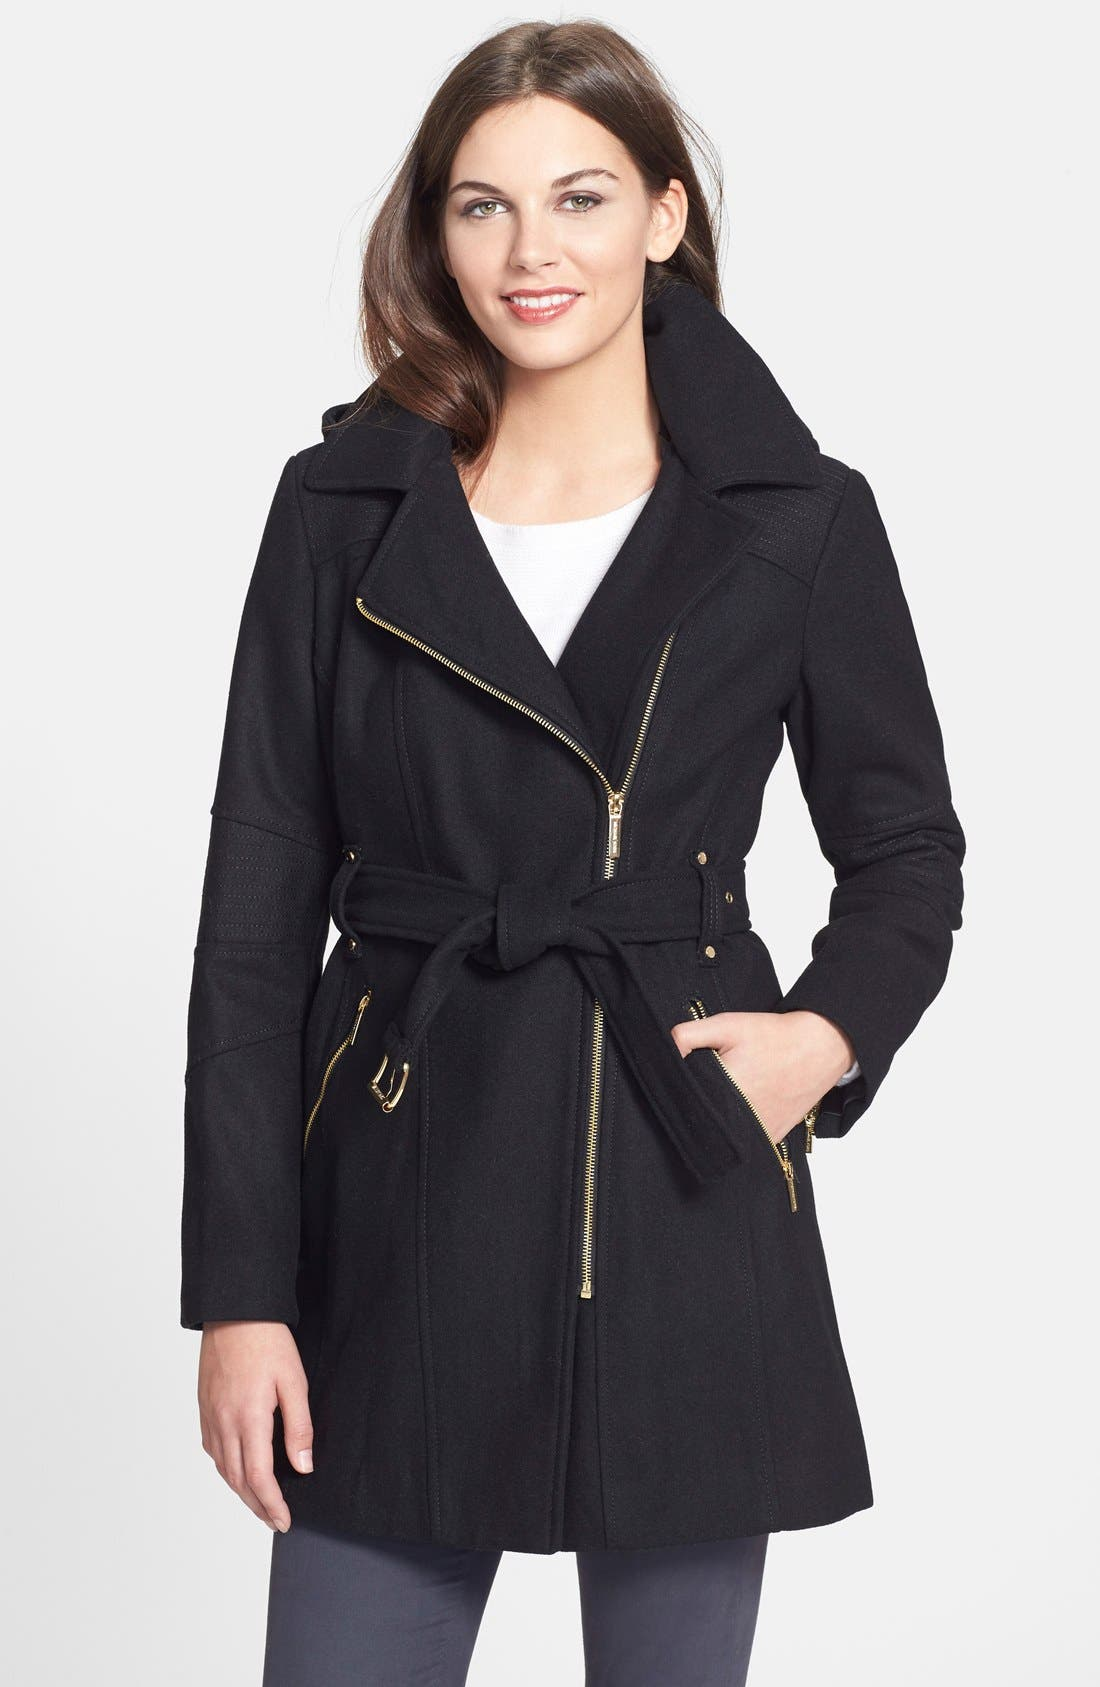 Alternate Image 1 Selected - MICHAEL Michael Kors Belted Hooded Wool Blend Asymmetrical Coat (Online Only)